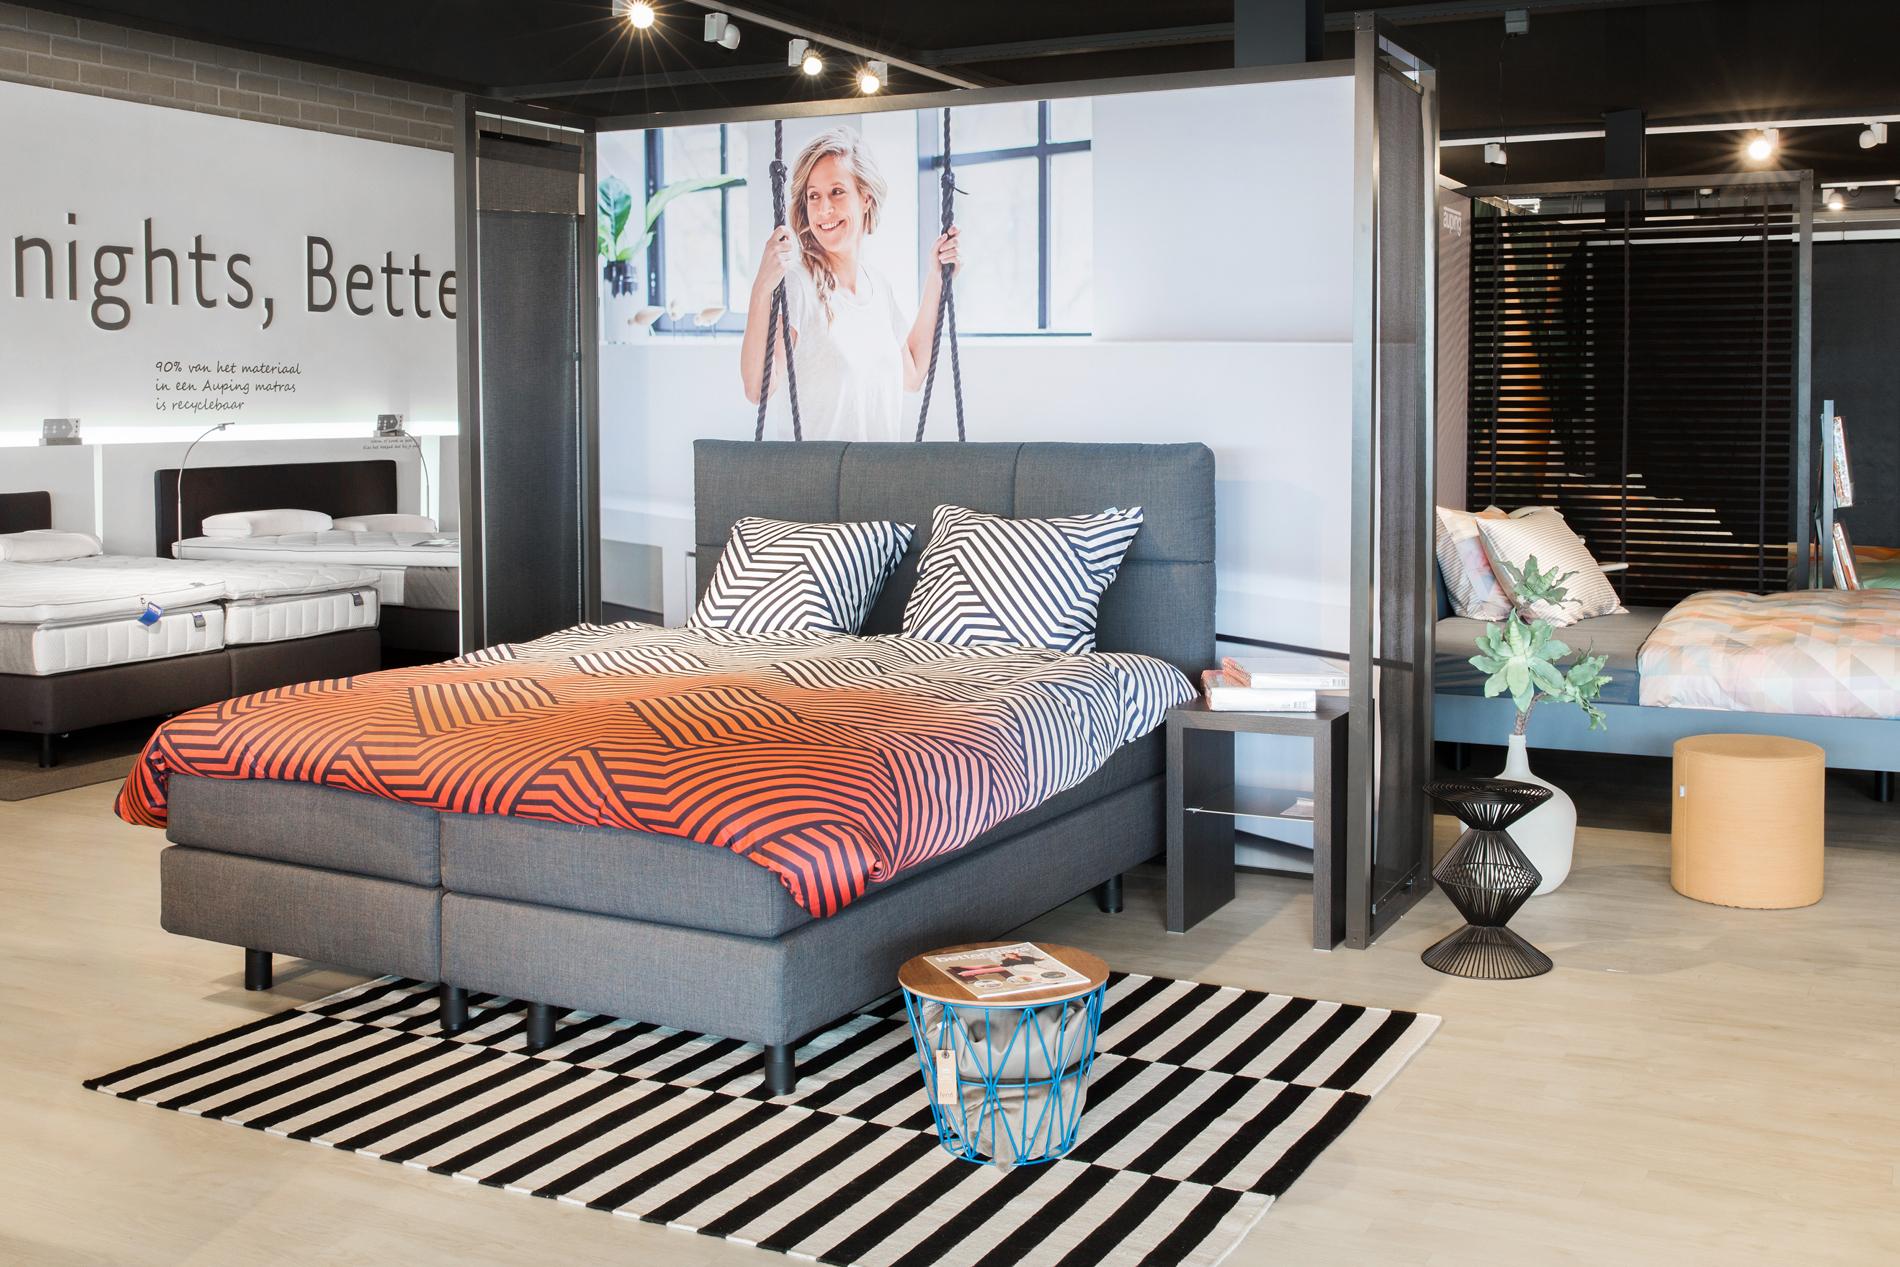 Auping Plaza Heerlen – Natural Talalay Latex Mattress and Latex Pillow Store in Heerlen Limburg